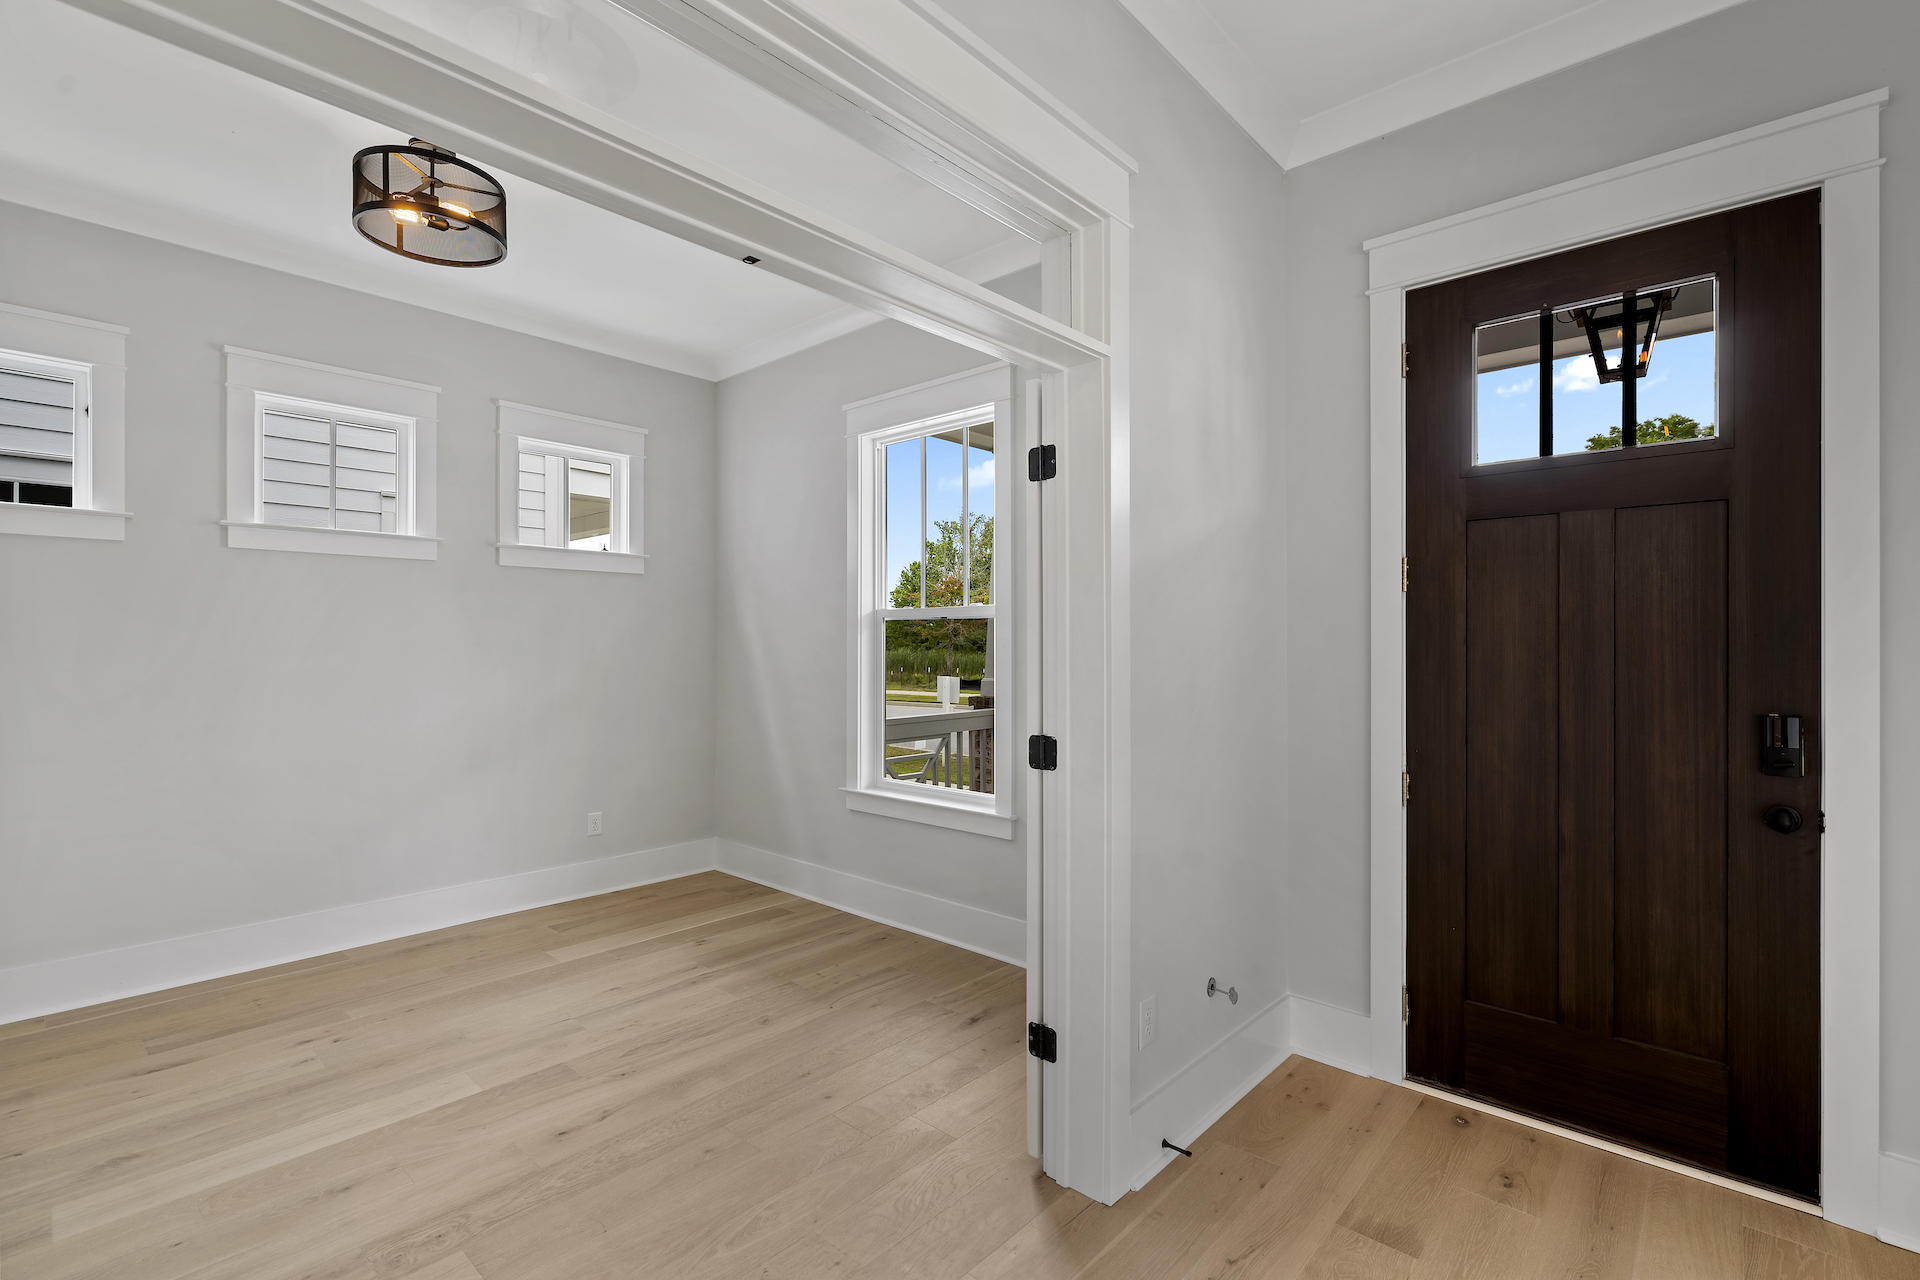 Midtown Homes For Sale - 1344 Upper Union, Mount Pleasant, SC - 0